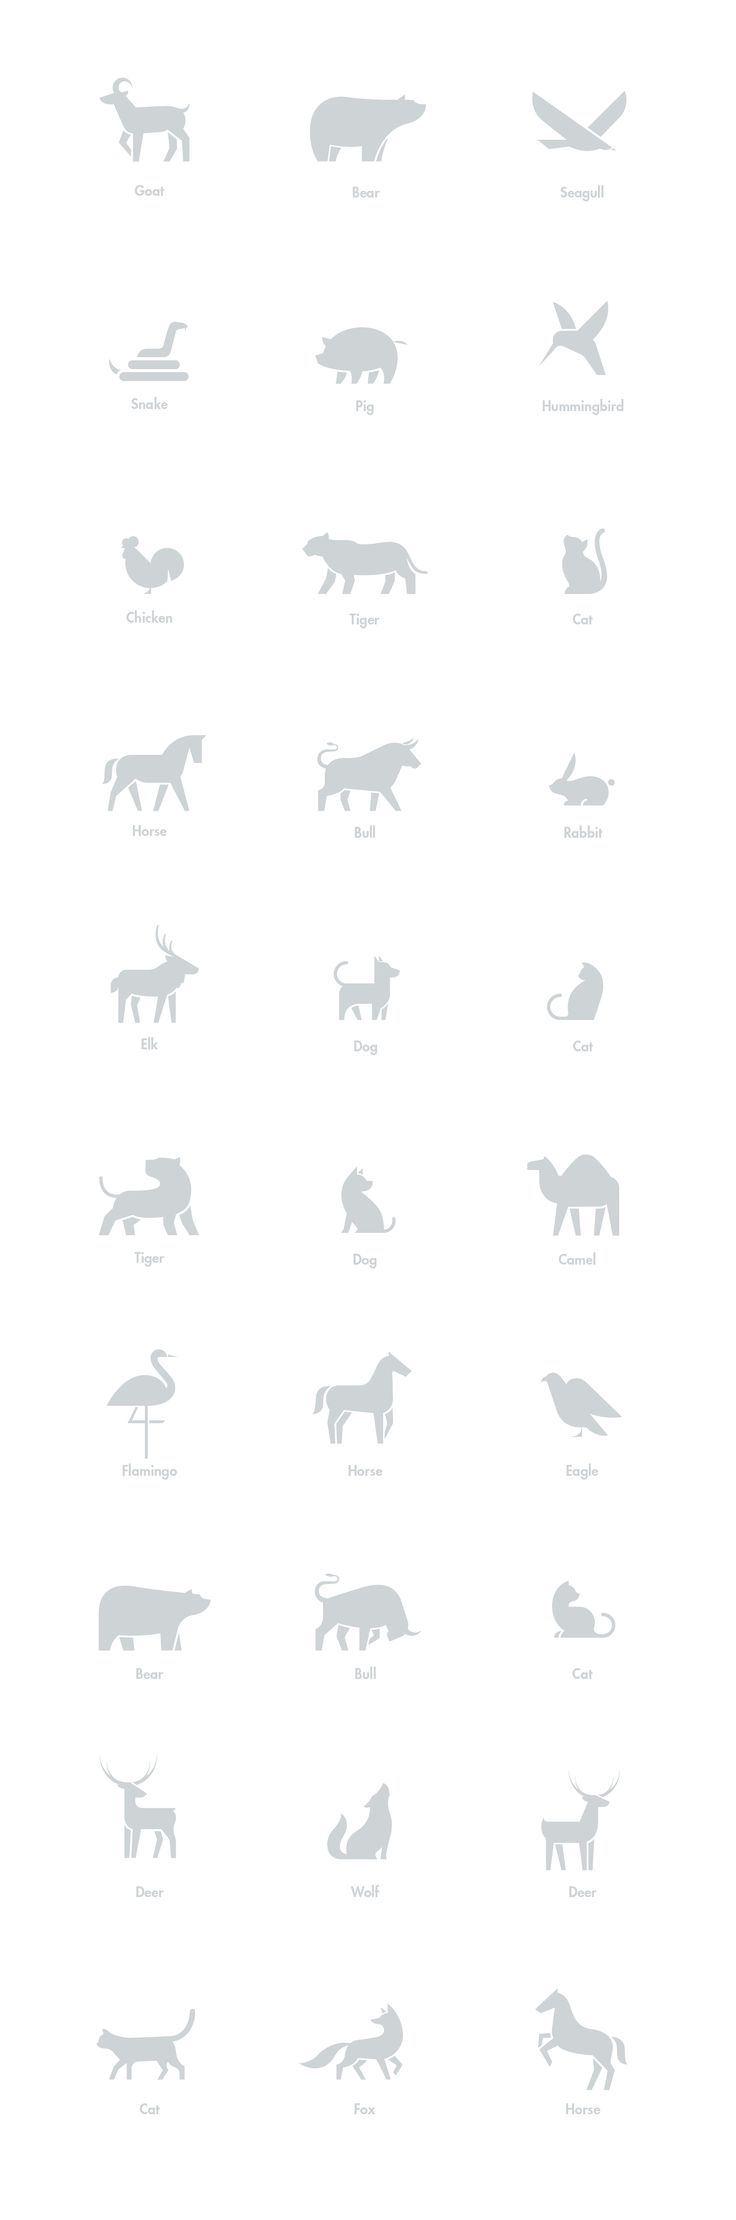 Animal eye chart design